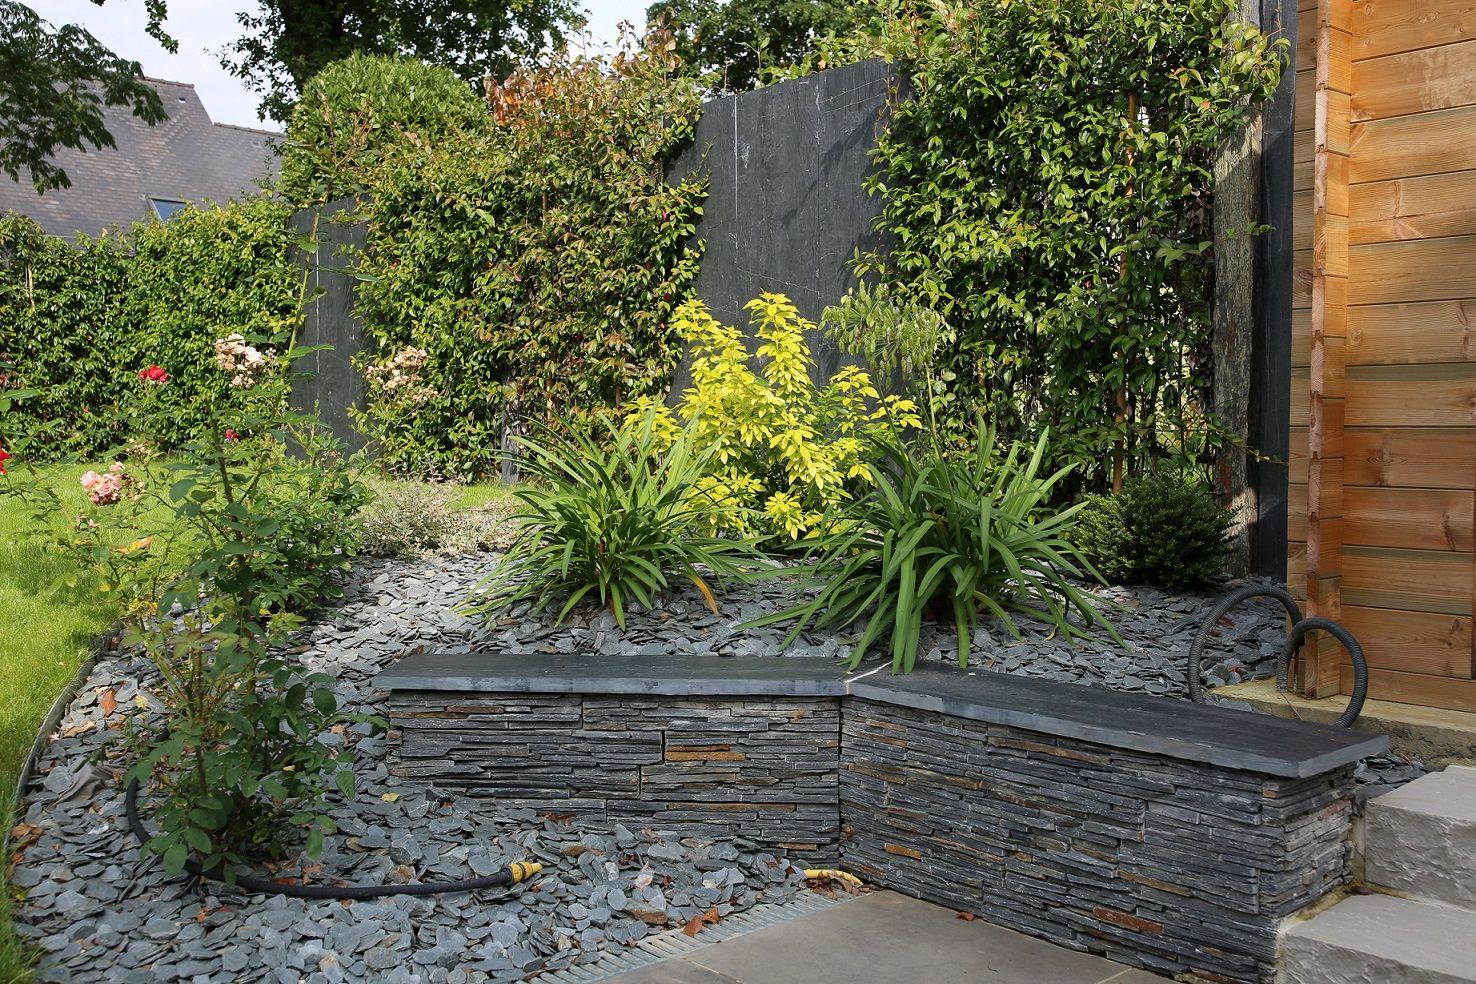 Massif En Pente Bordure Paysage Jardins Amenagement Jardin